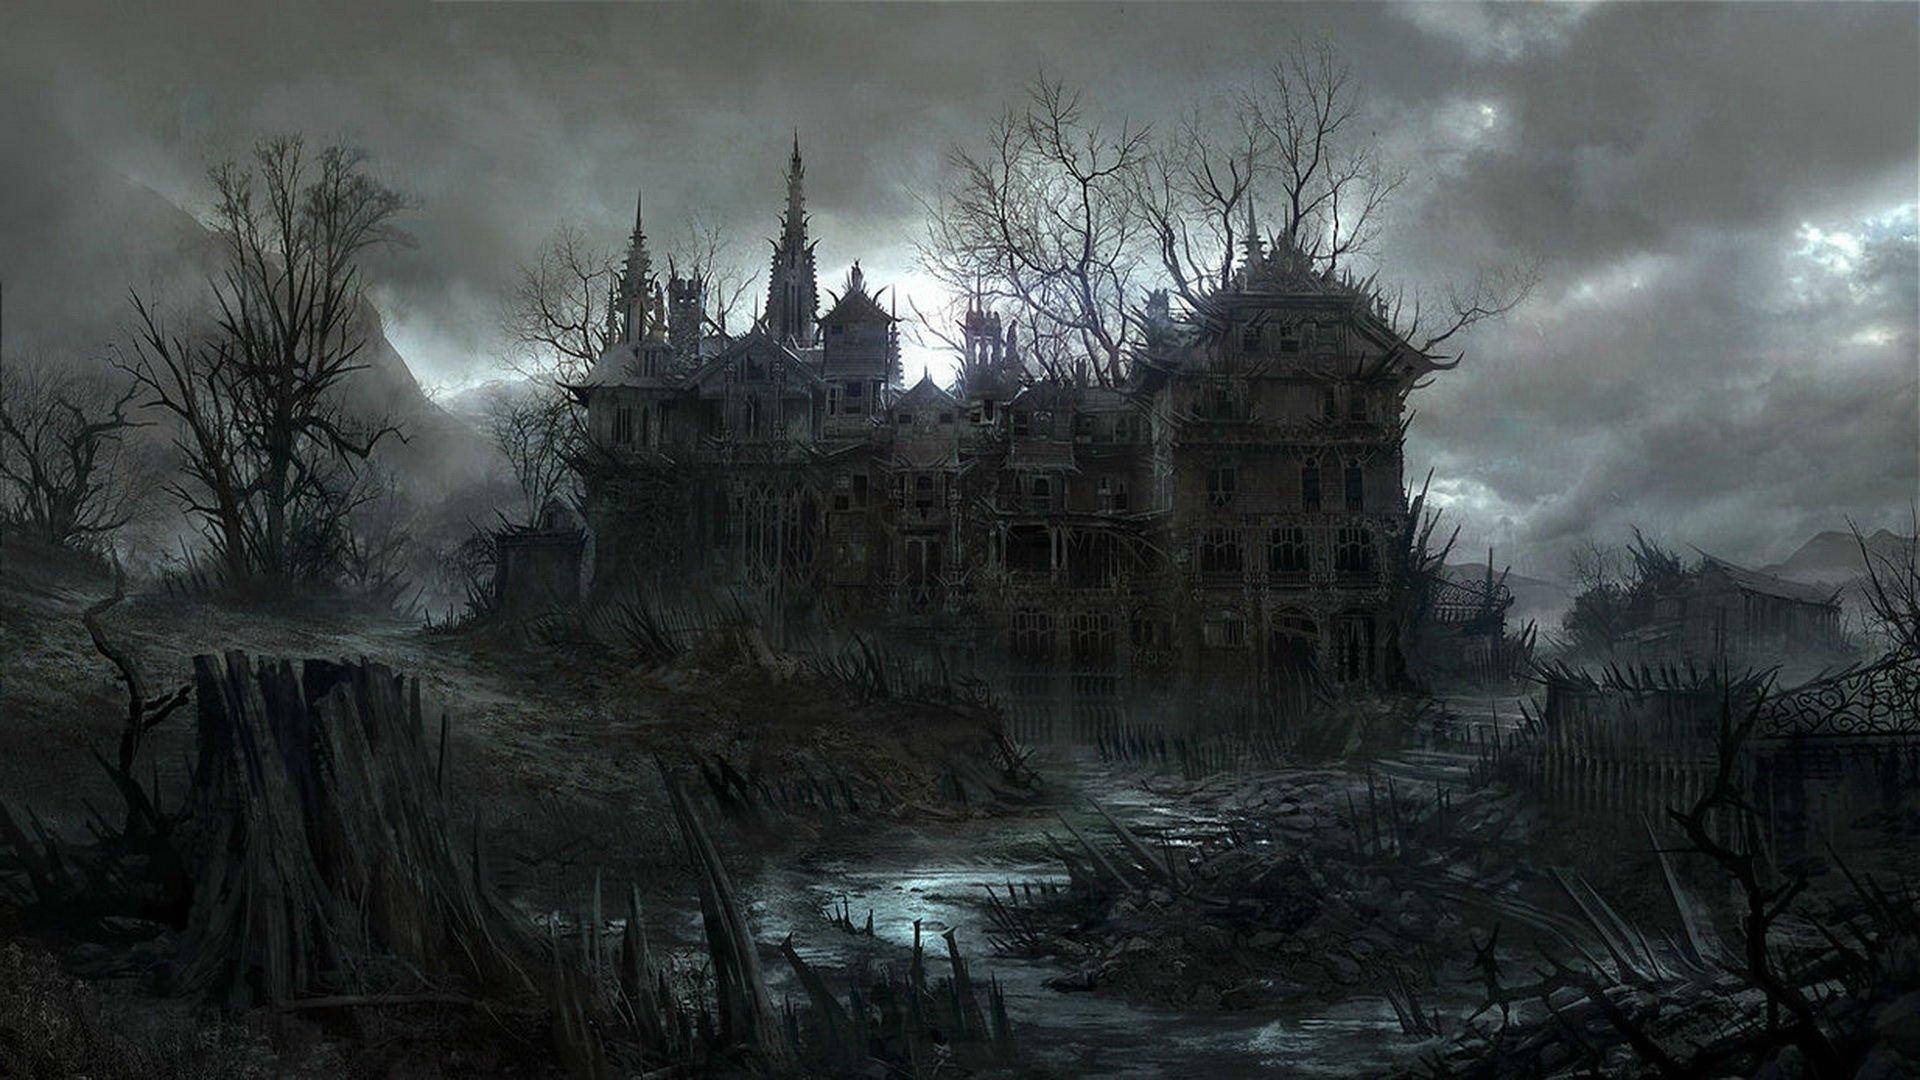 Haunted House | Booknvolume